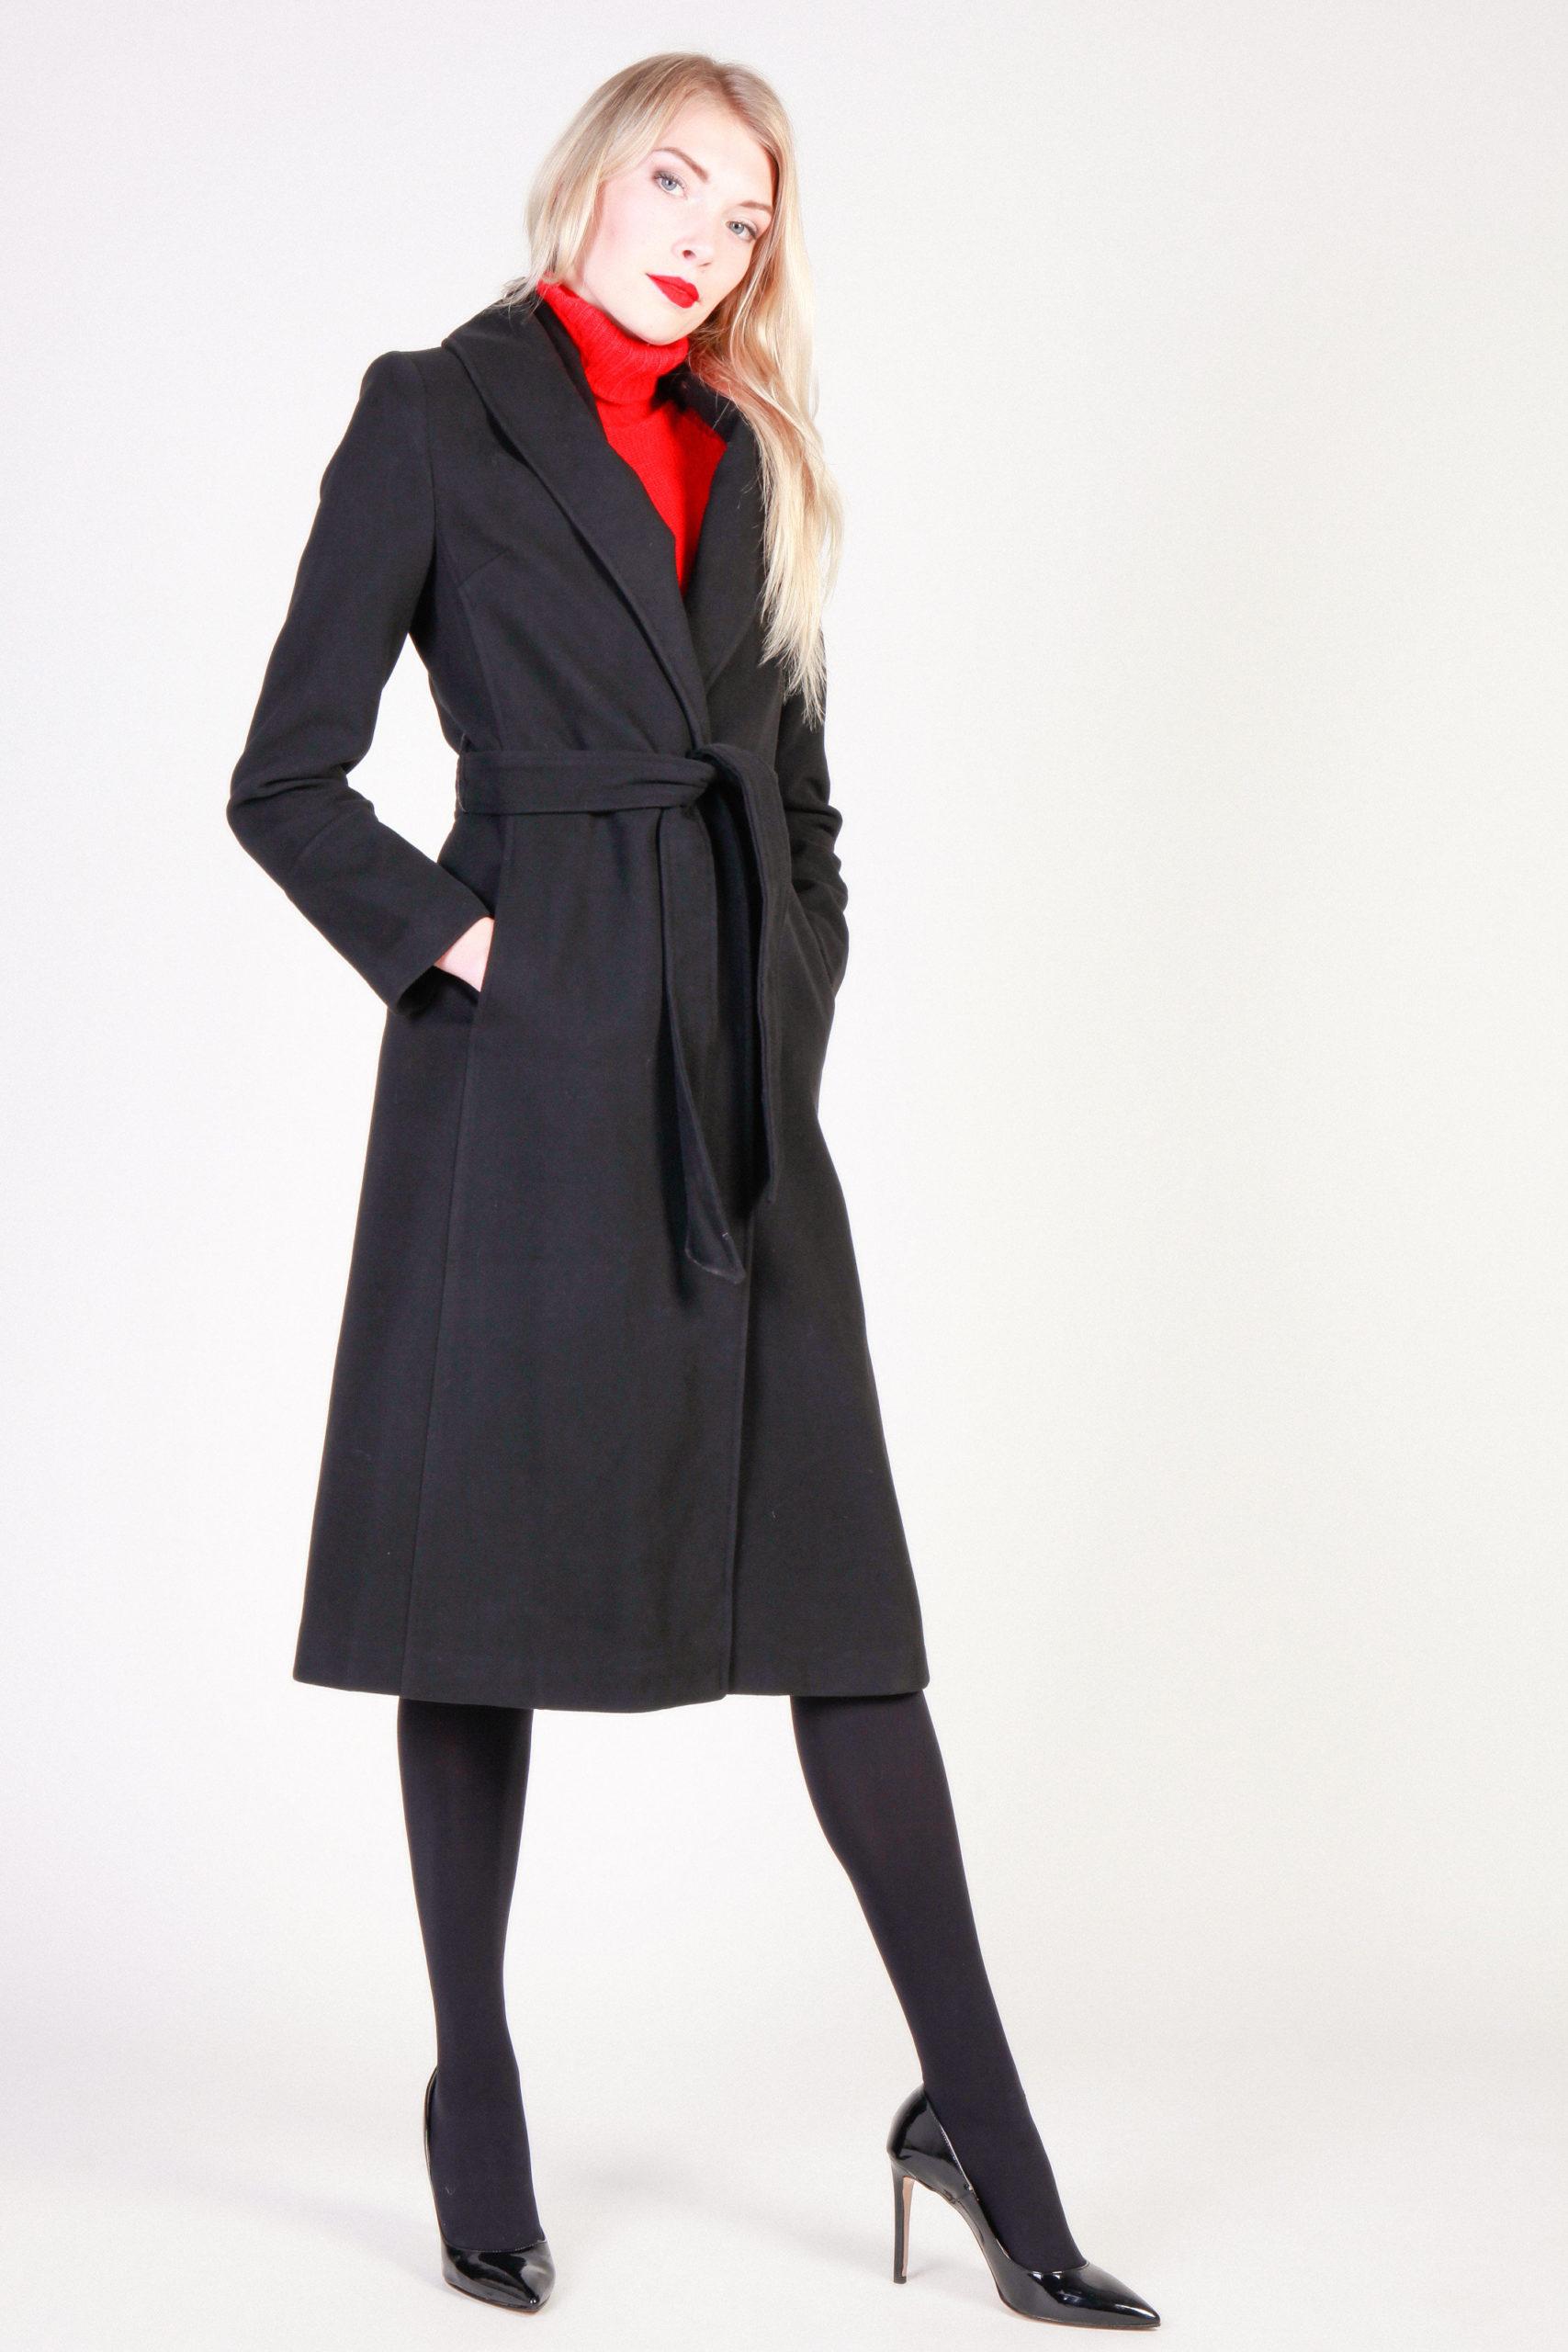 long coat with a belt